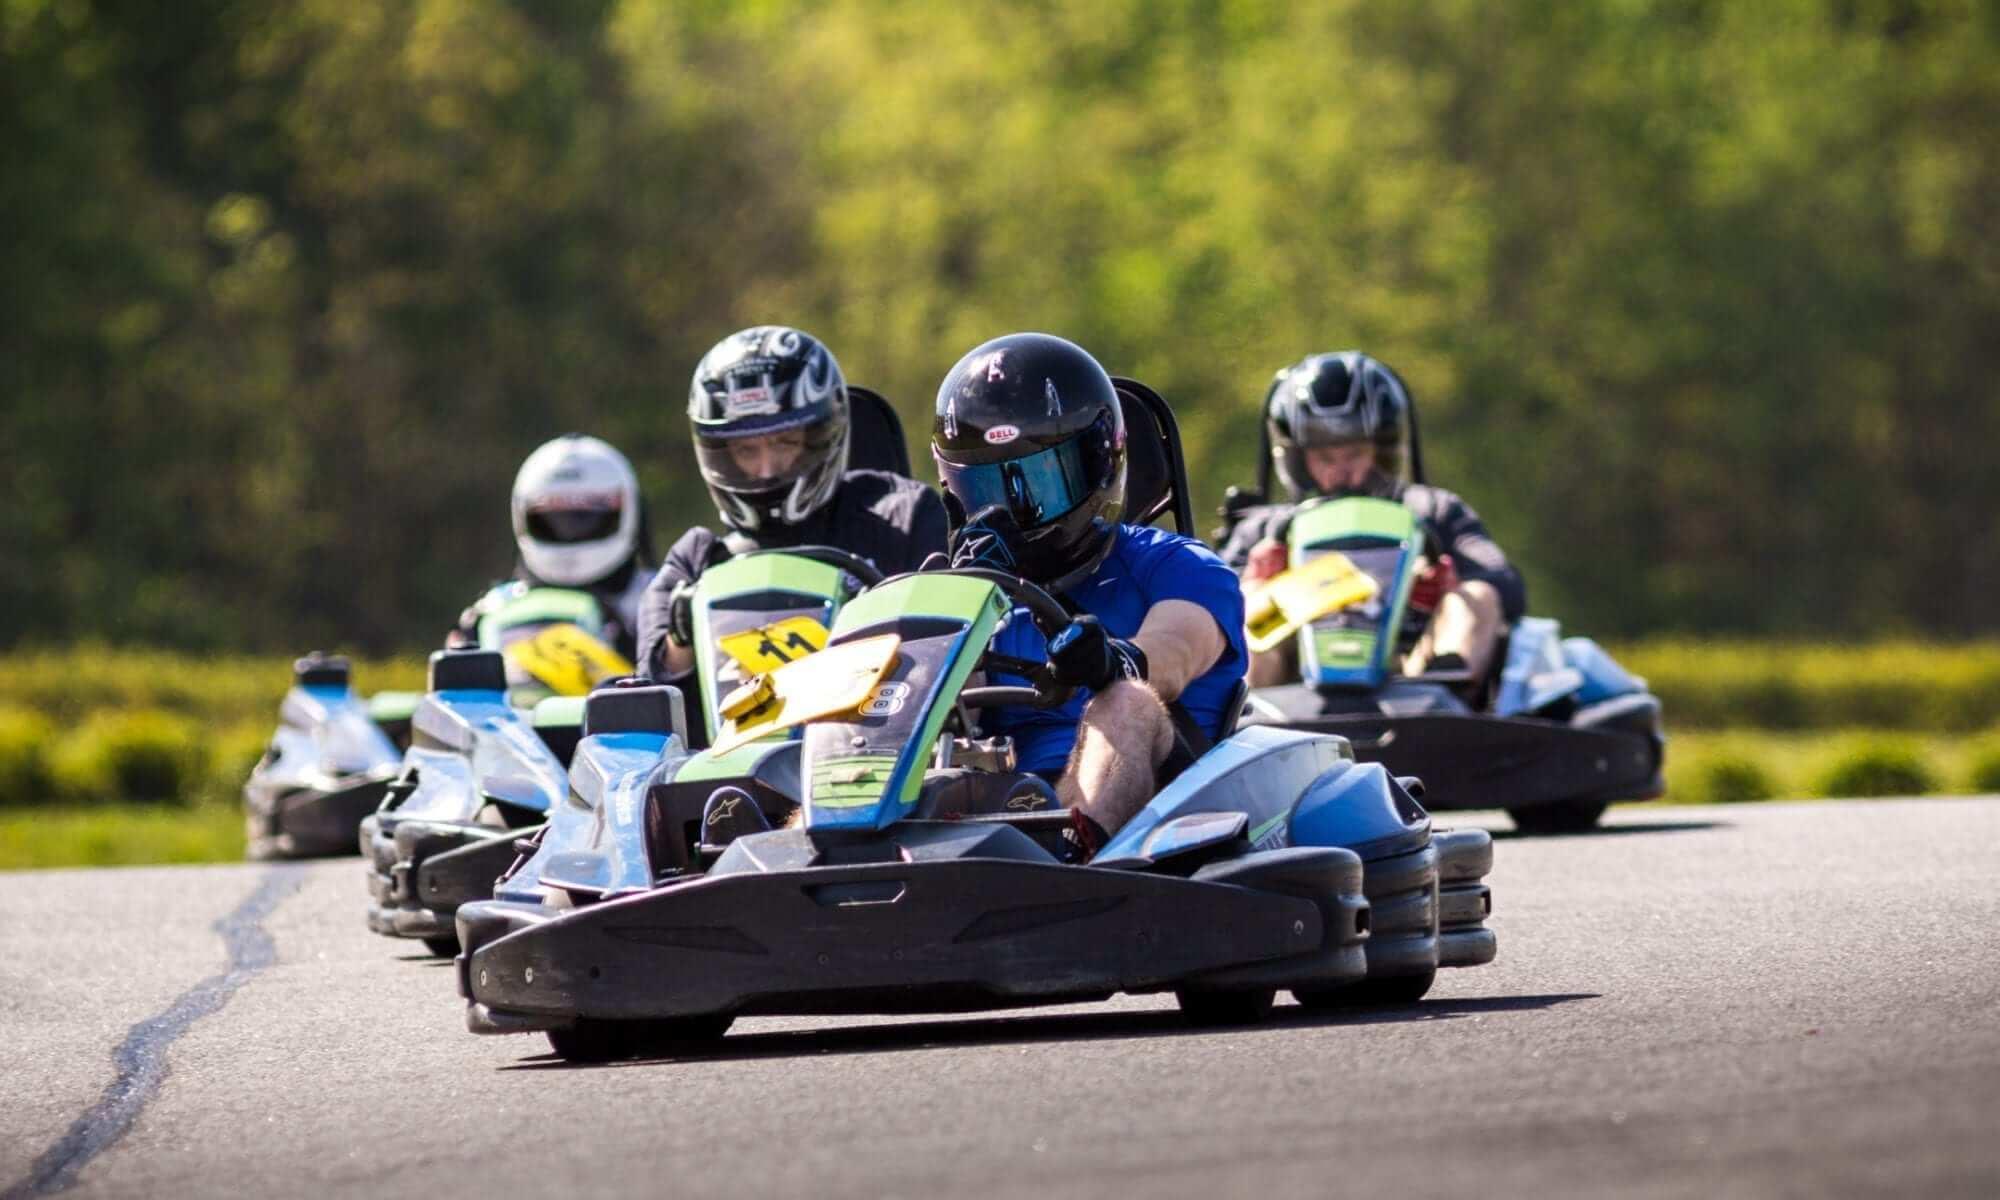 Karting 101 Archives - AMP Karting